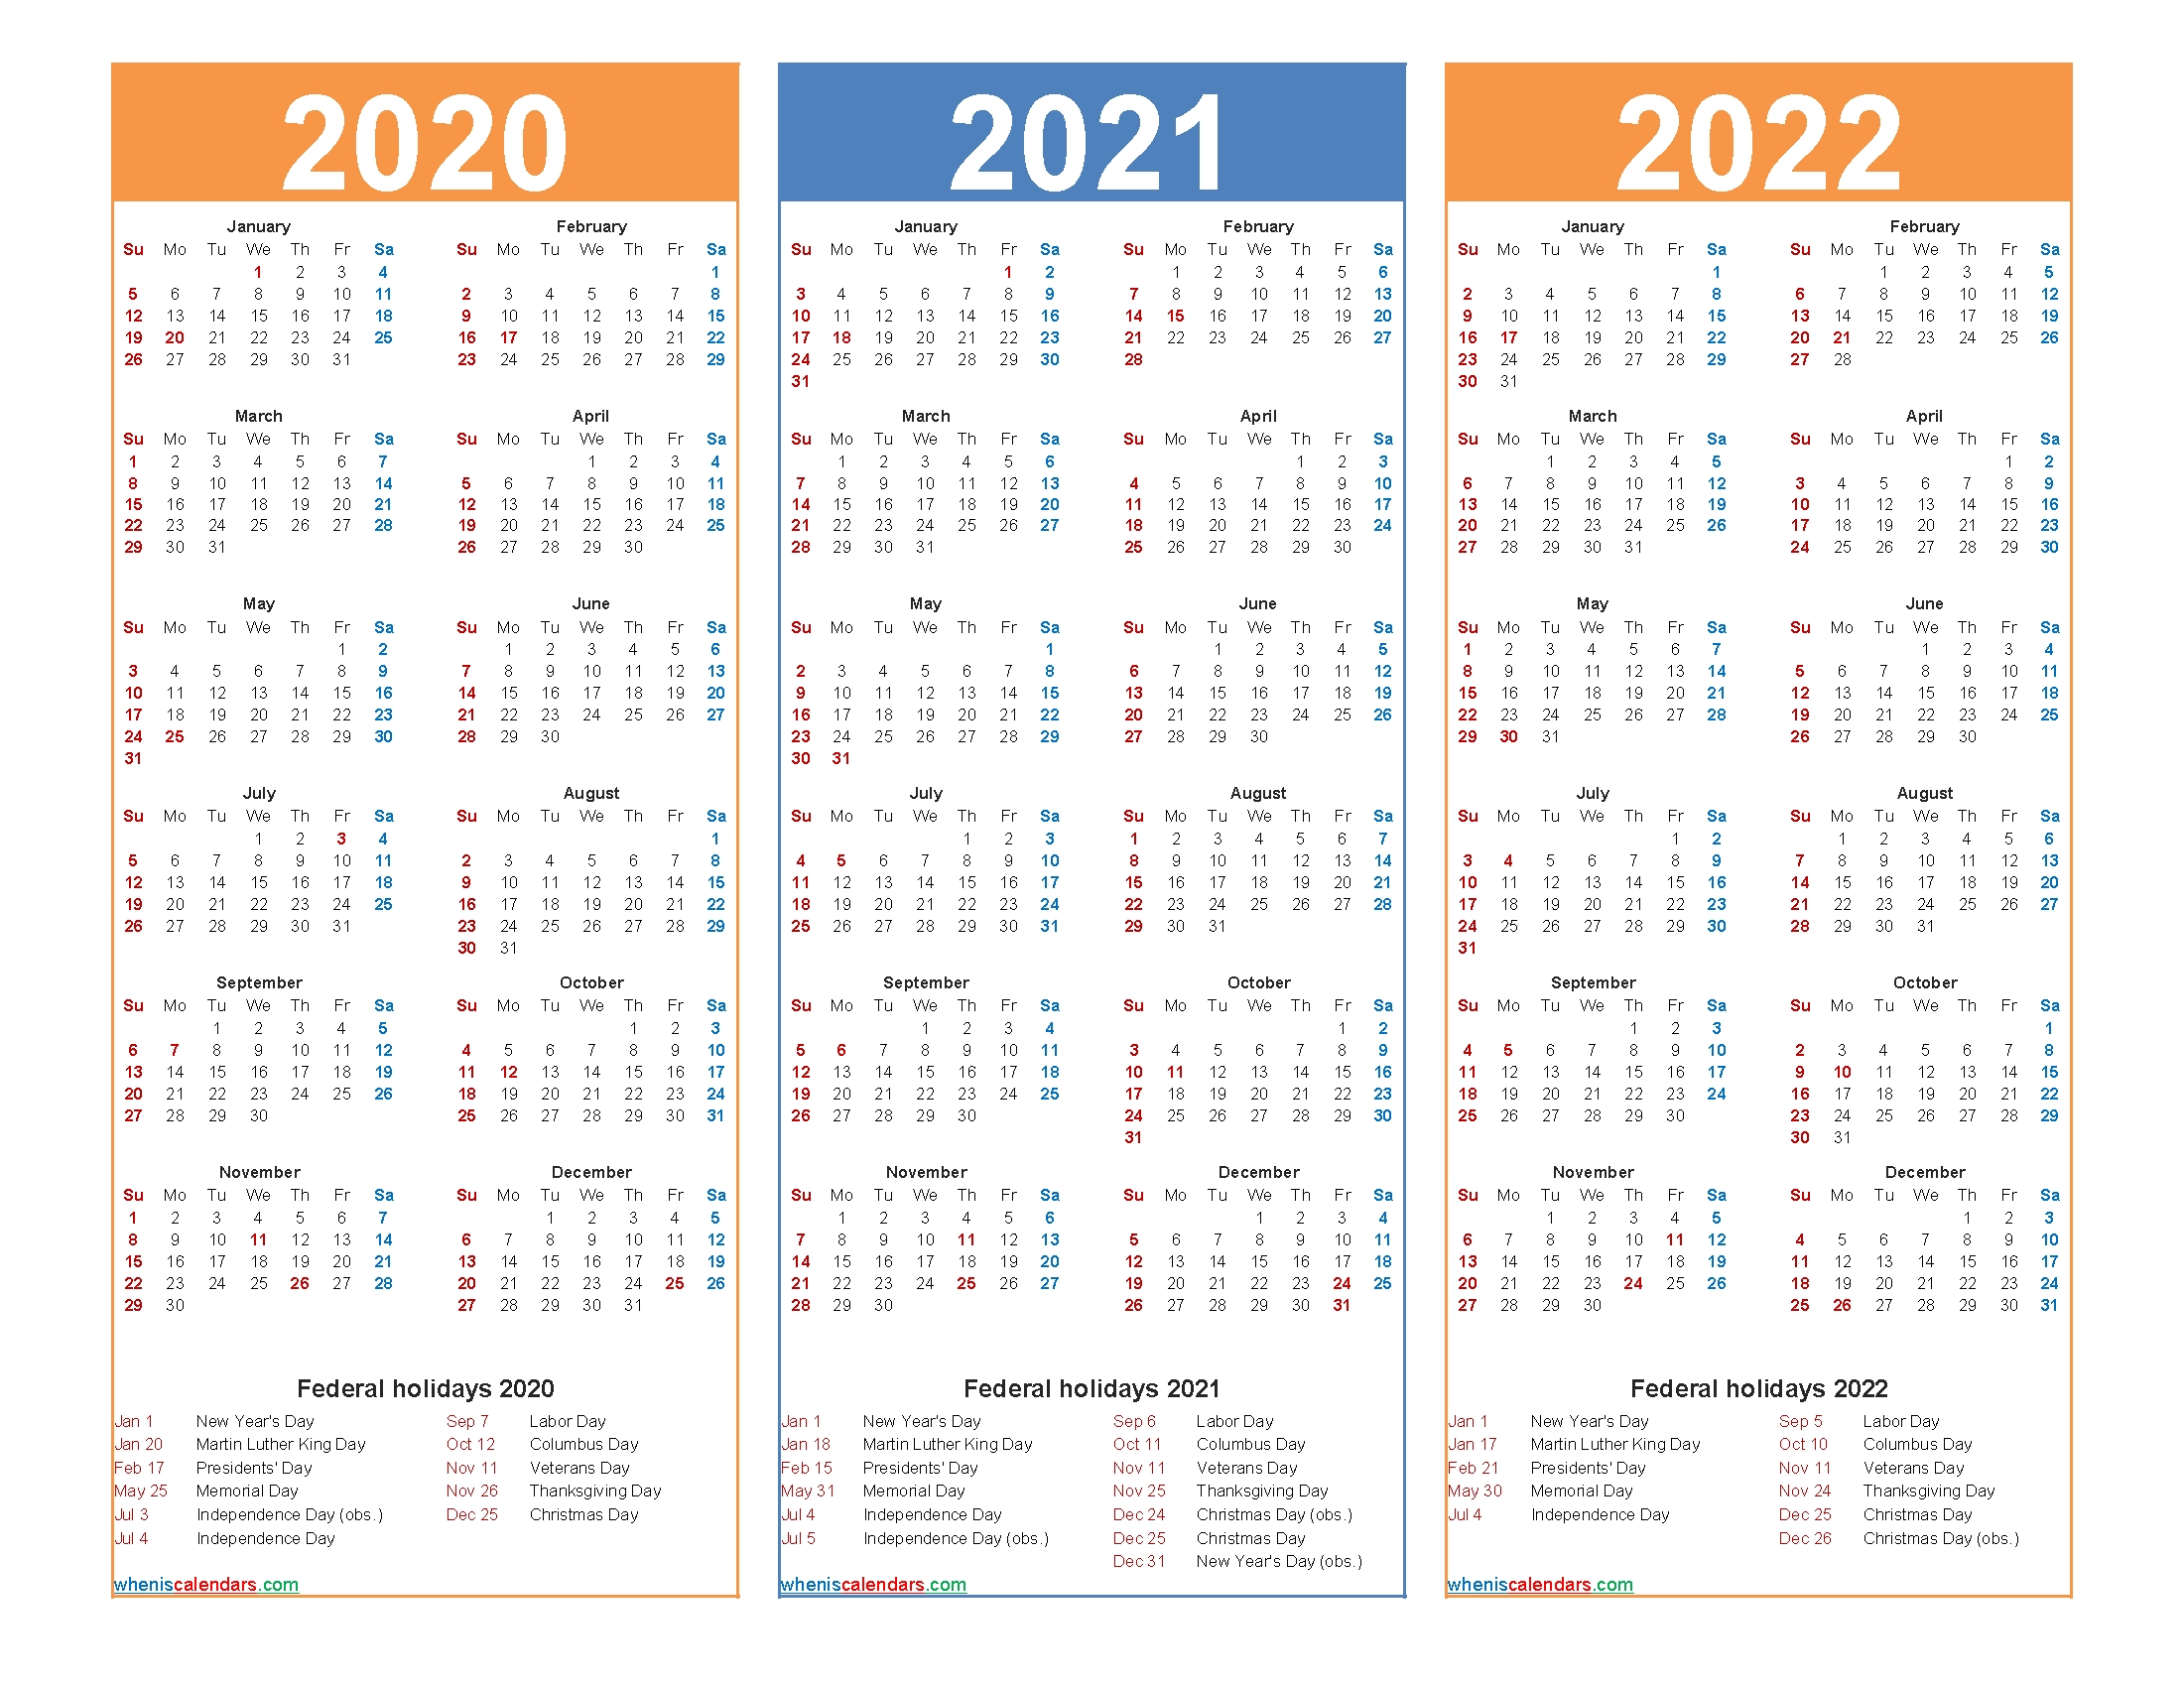 Printable Calendar 2020 2021 2022 With Holidays – Free with regard to 2020 2021 2022 Calendar Printable